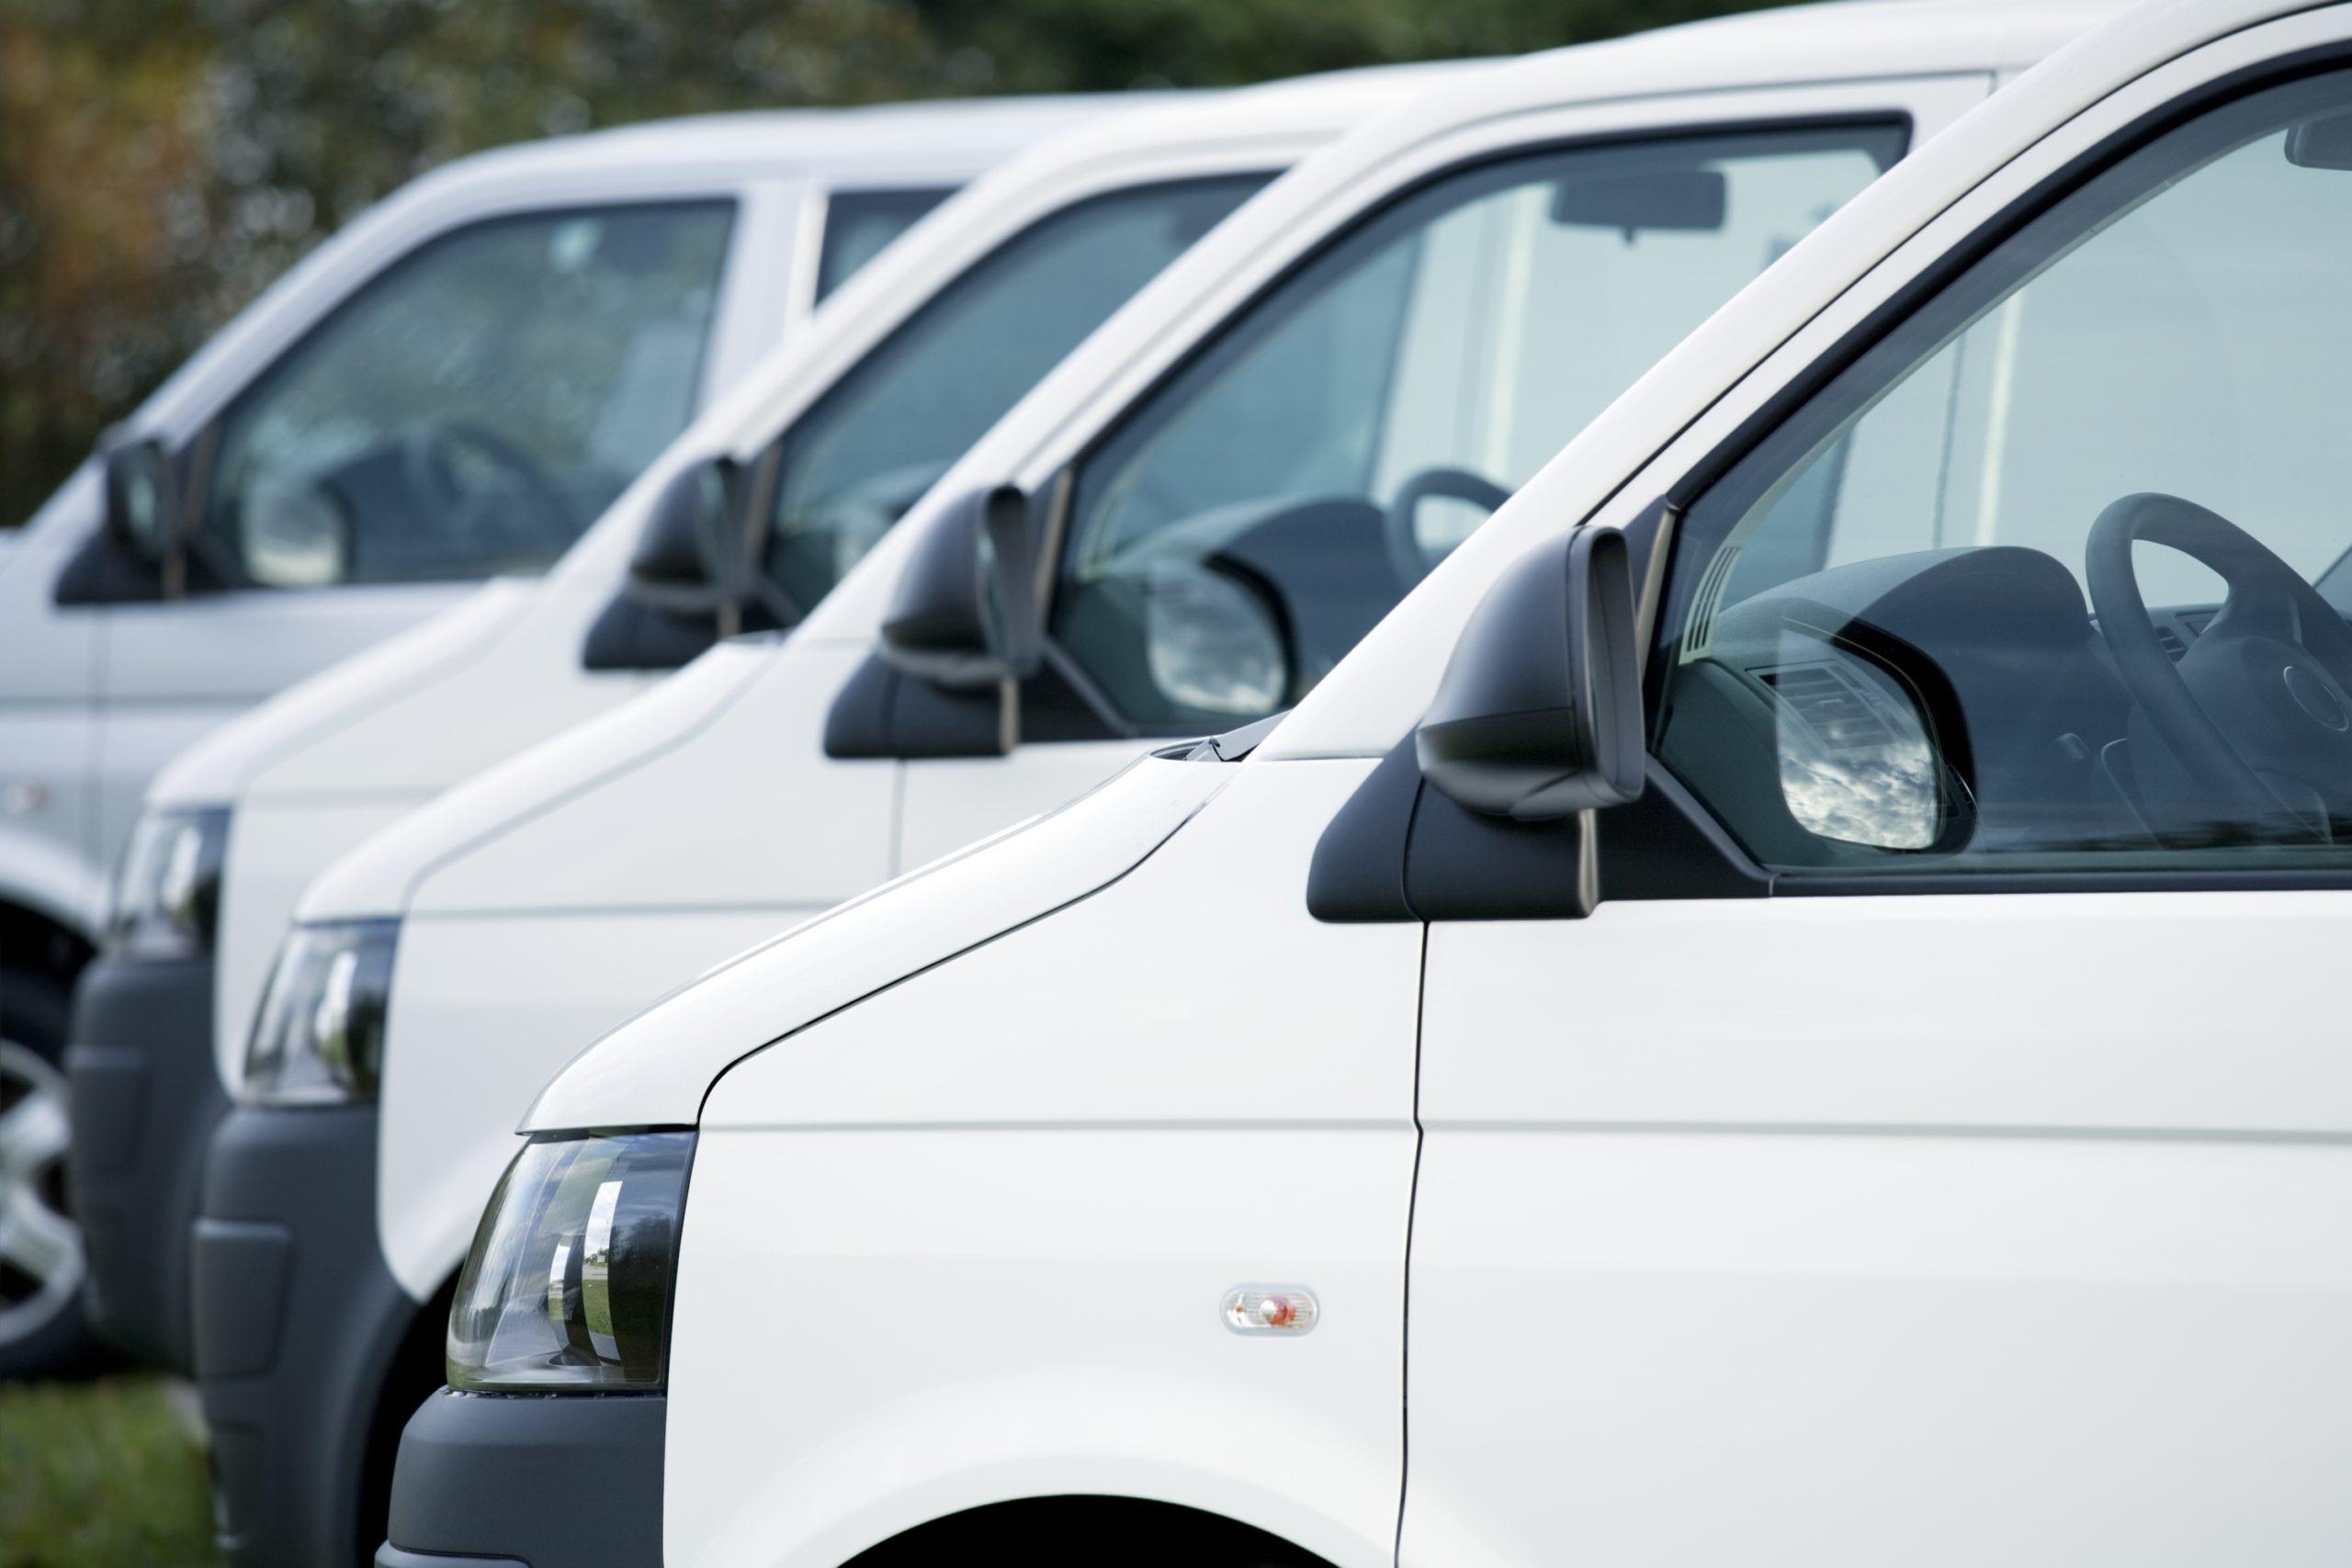 White Vans in Stock